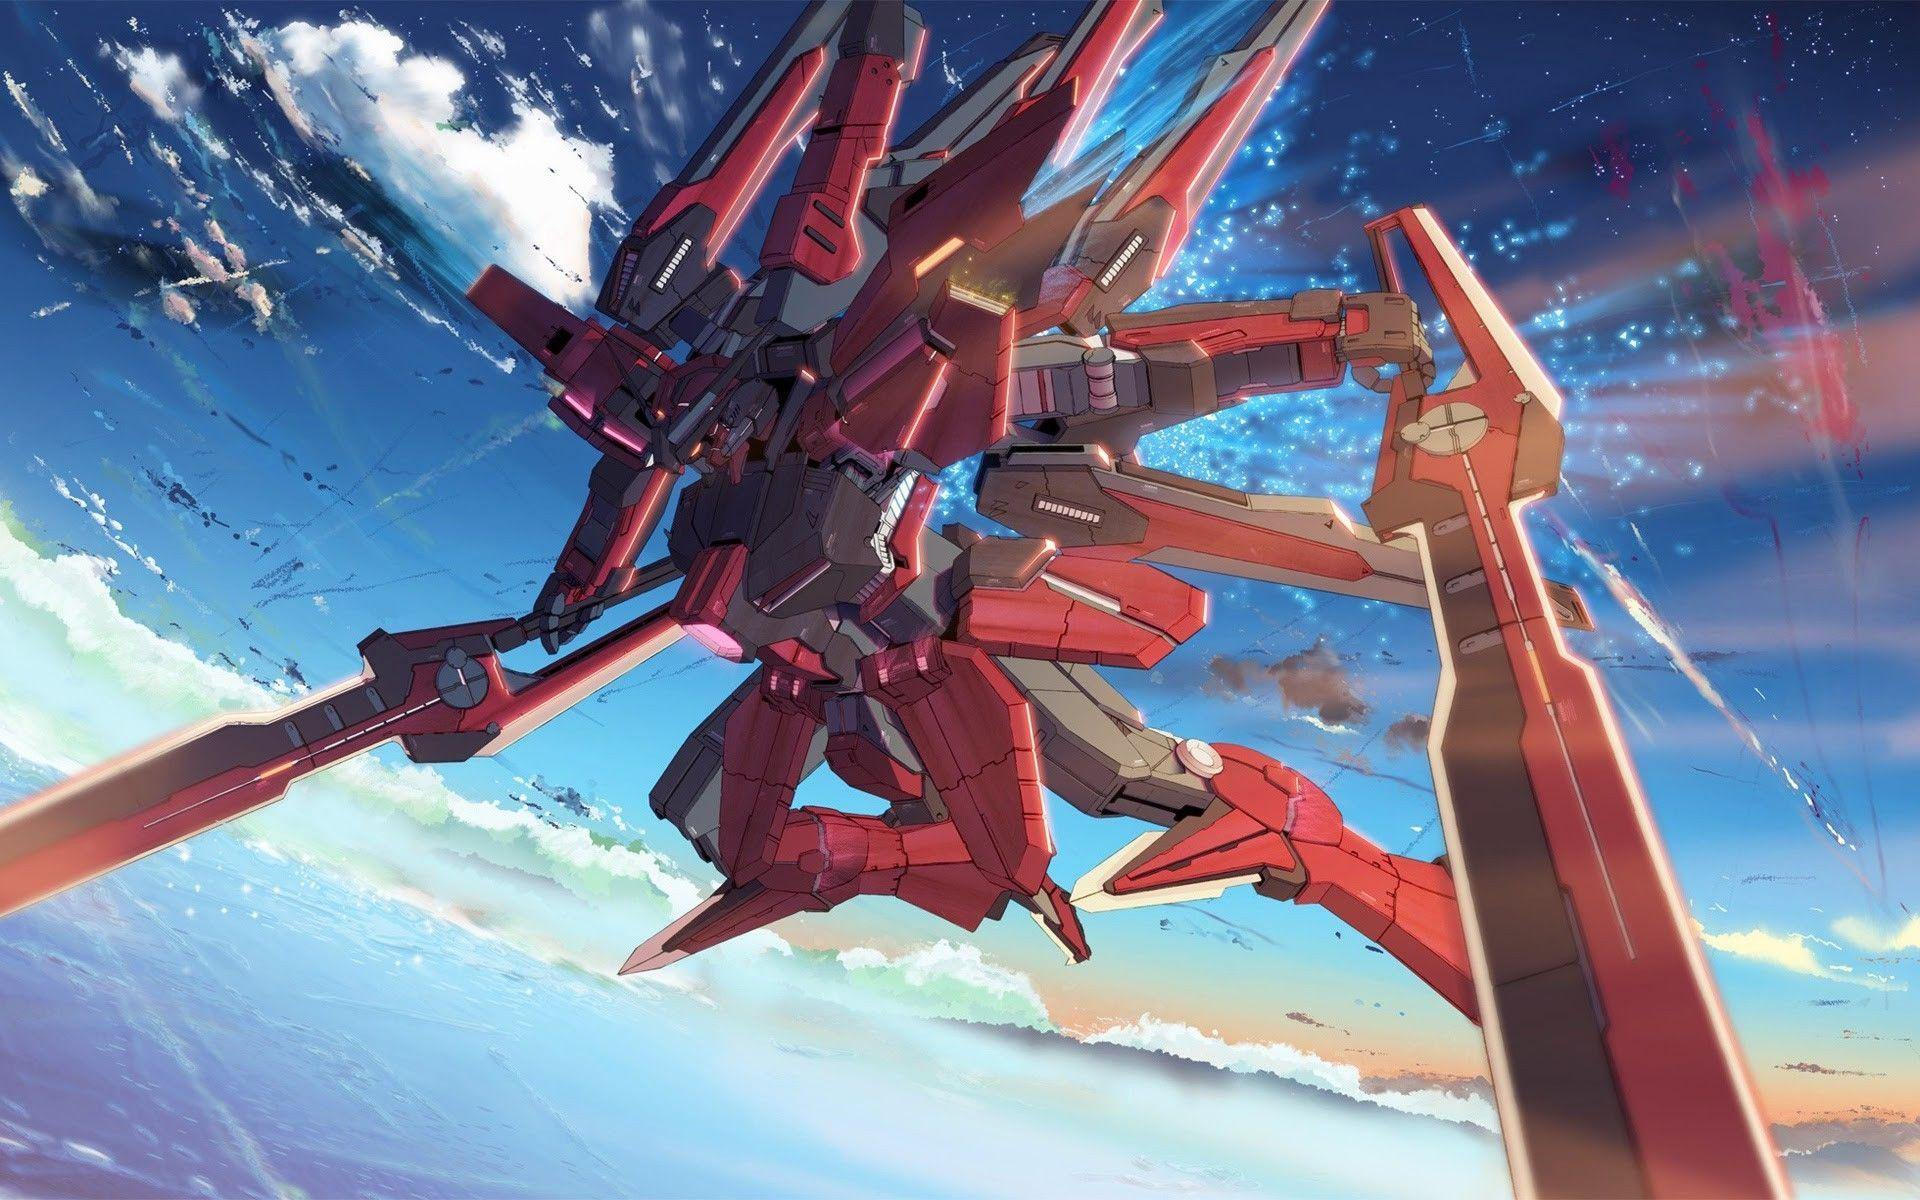 Gundam 00 Anime Mecha Sky a917 HD Wallpaper Gundam, Novel